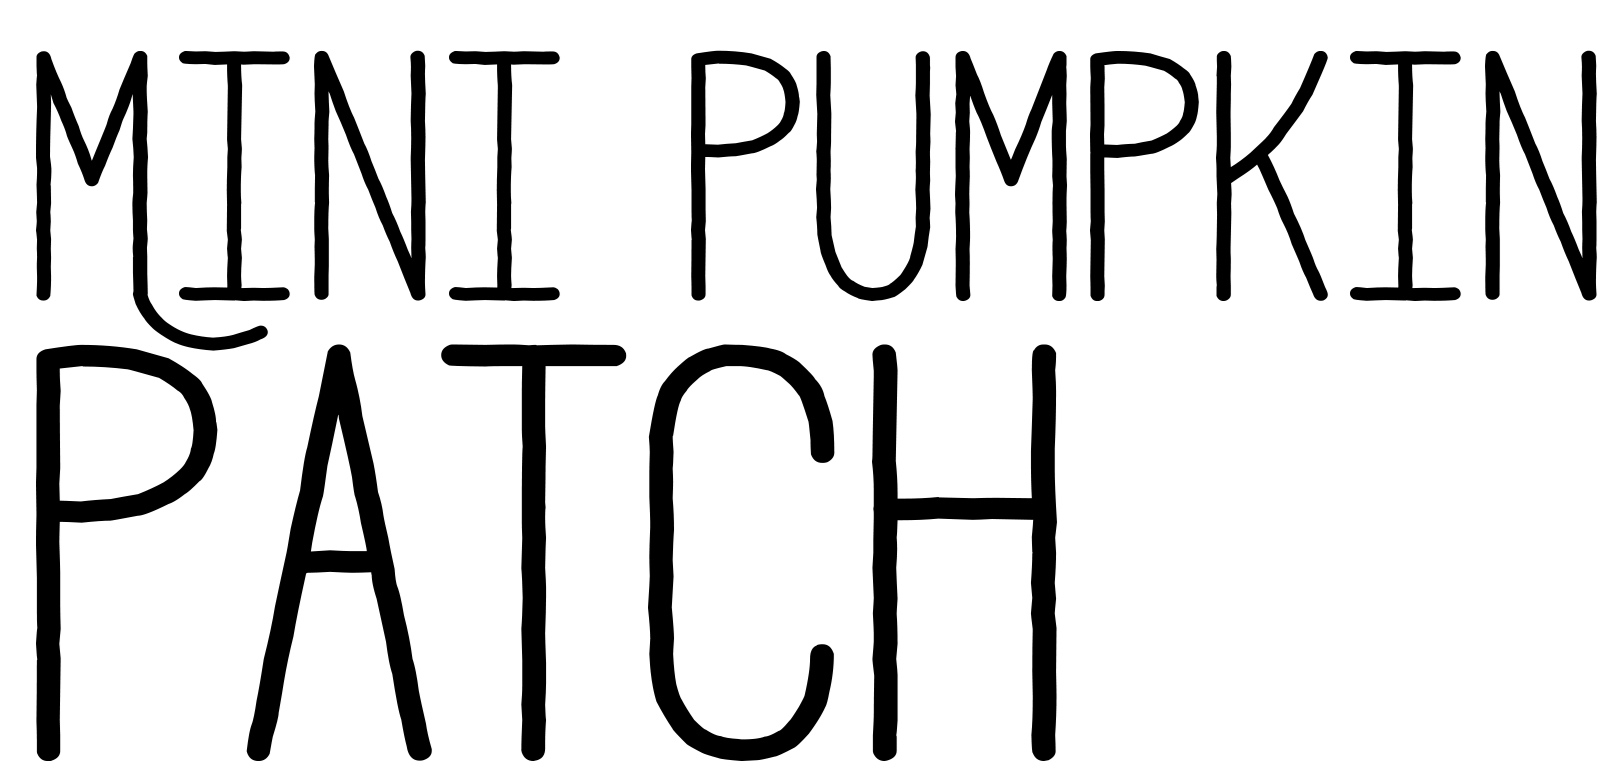 Mini Pumpkin Patch - Crochet Pattern - The Roving Nomad